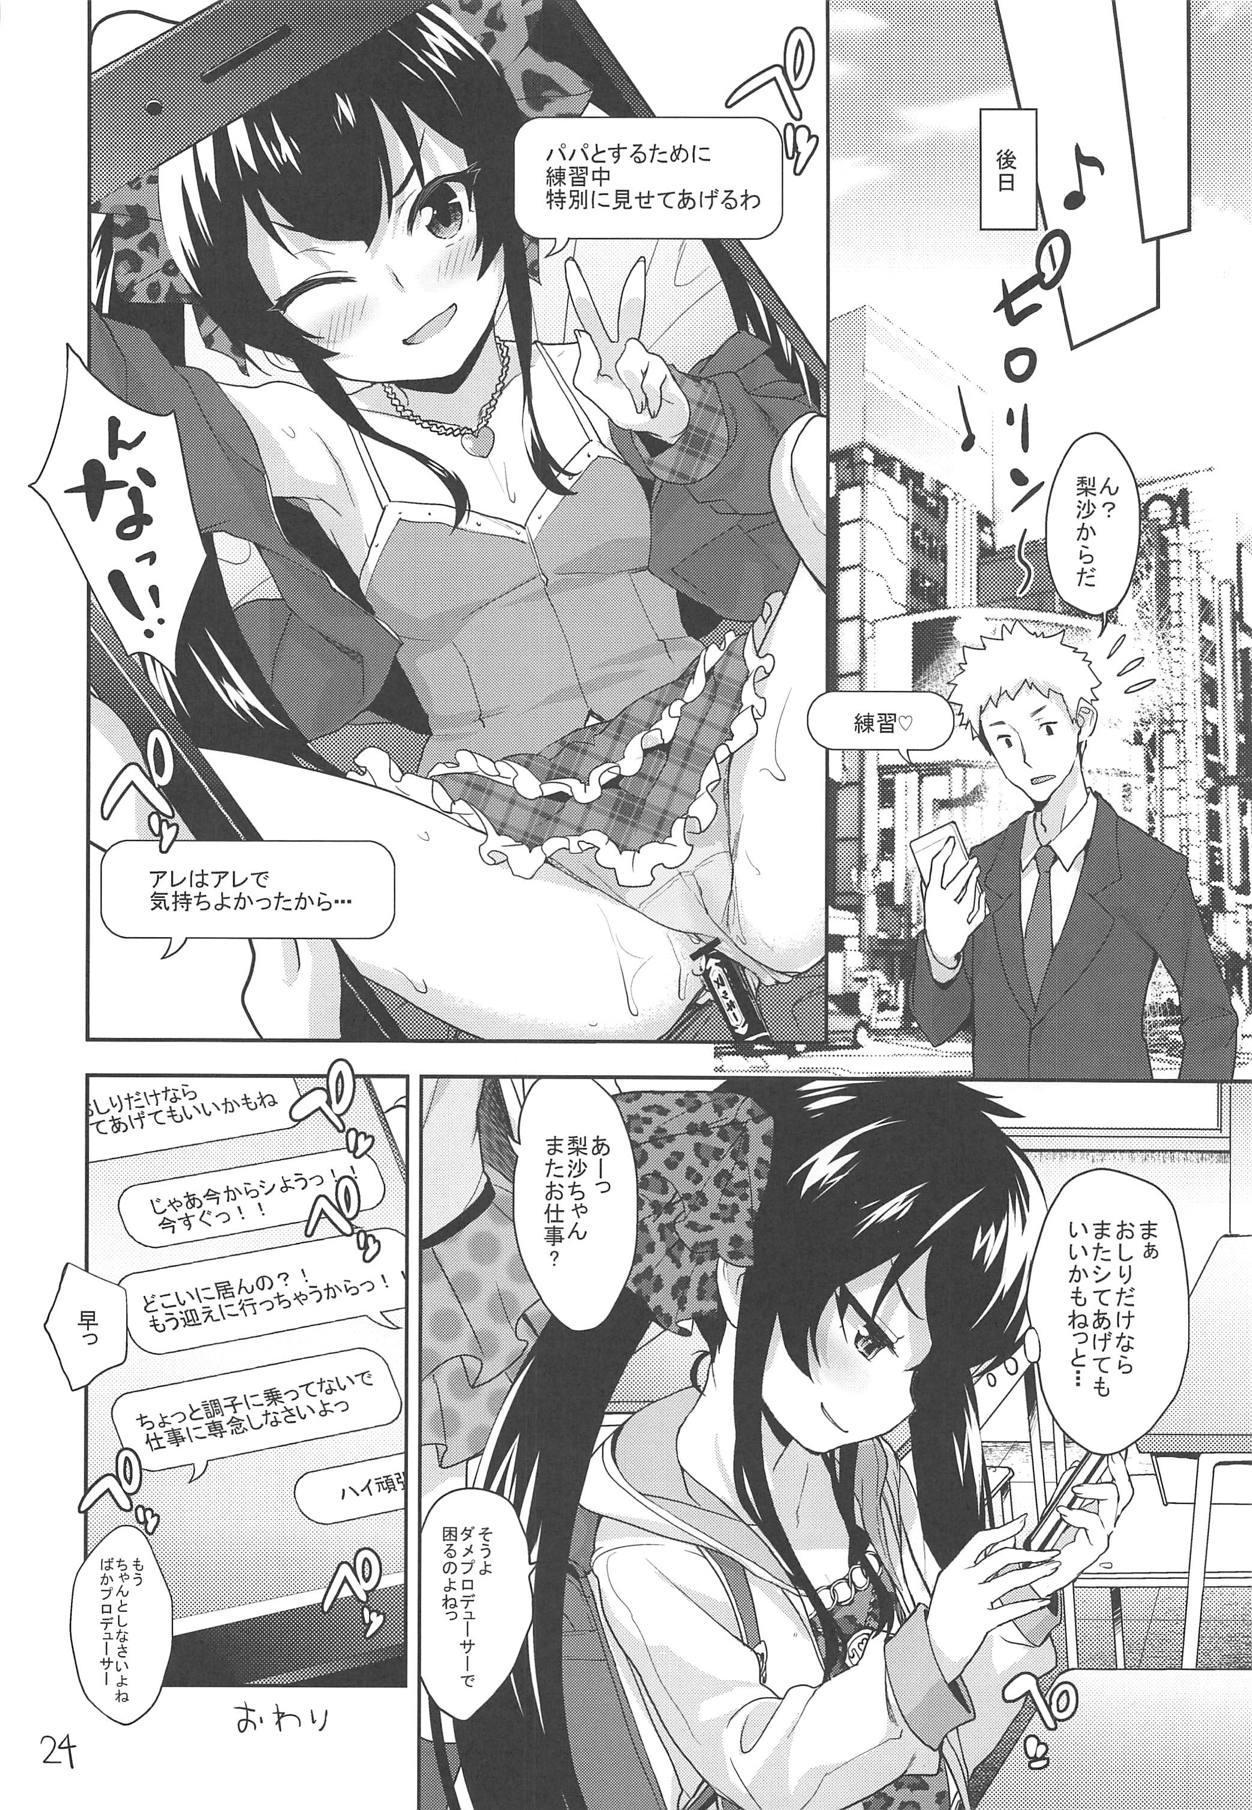 Oshiri de Yarasete Varisa-chan 22